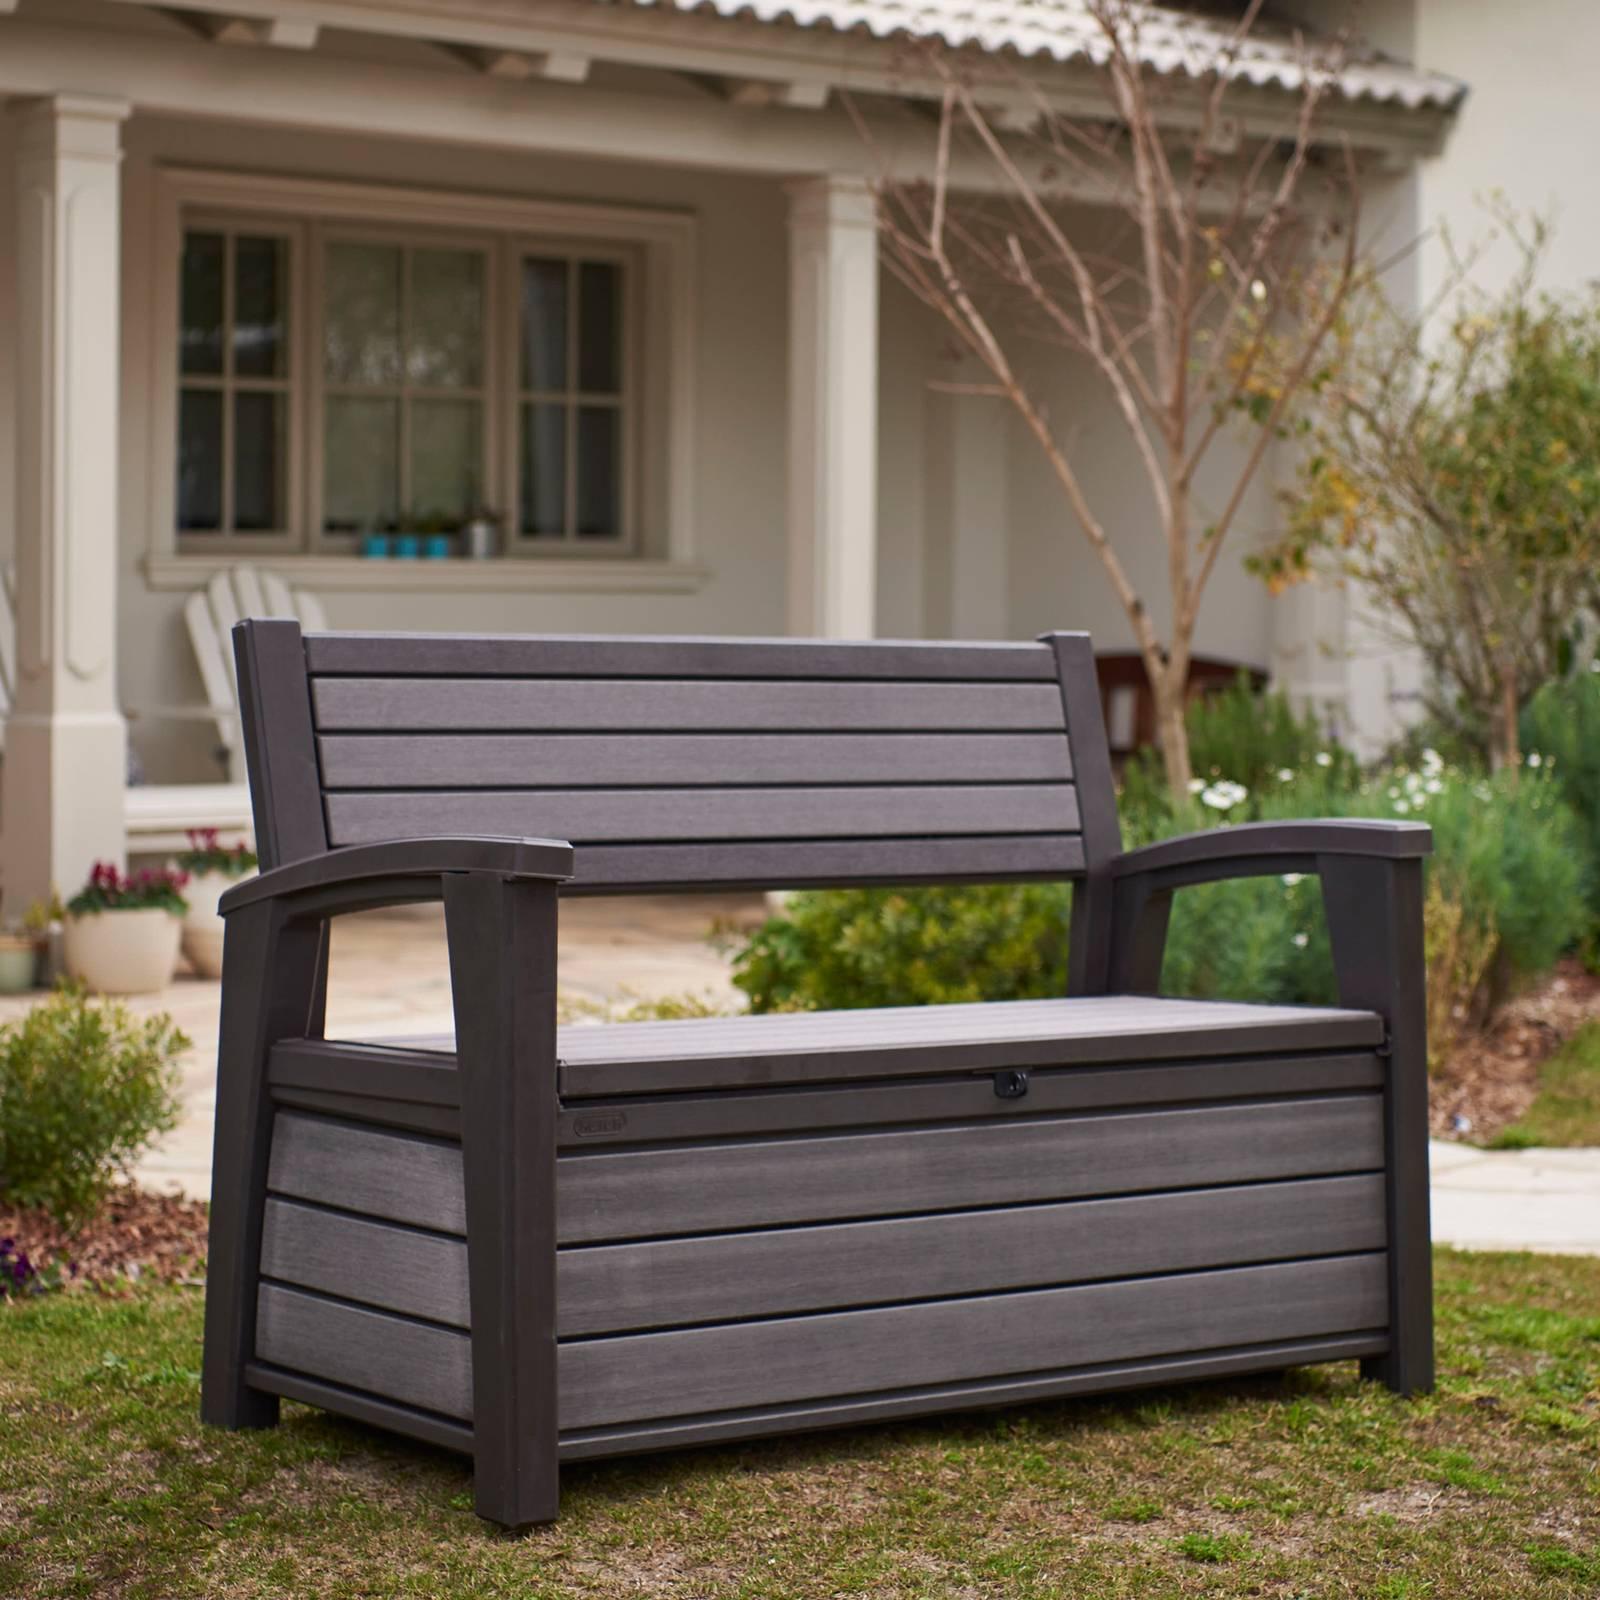 Plastová lavica s úložným boxom Hudson Brown 133 x 61 x 89 cm KETER